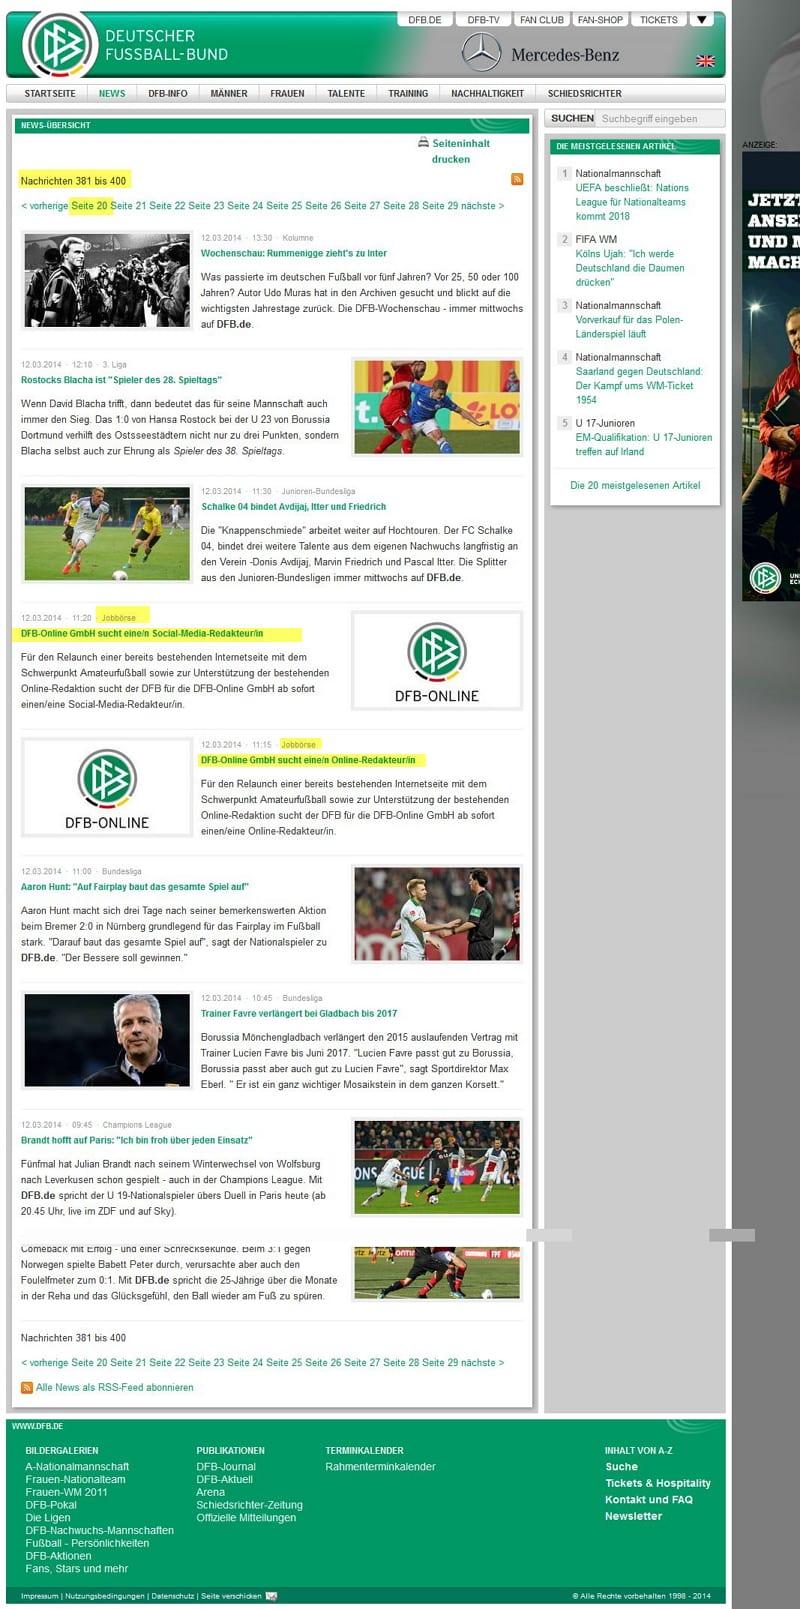 DFB sucht Online- und Social Media-Redakteur